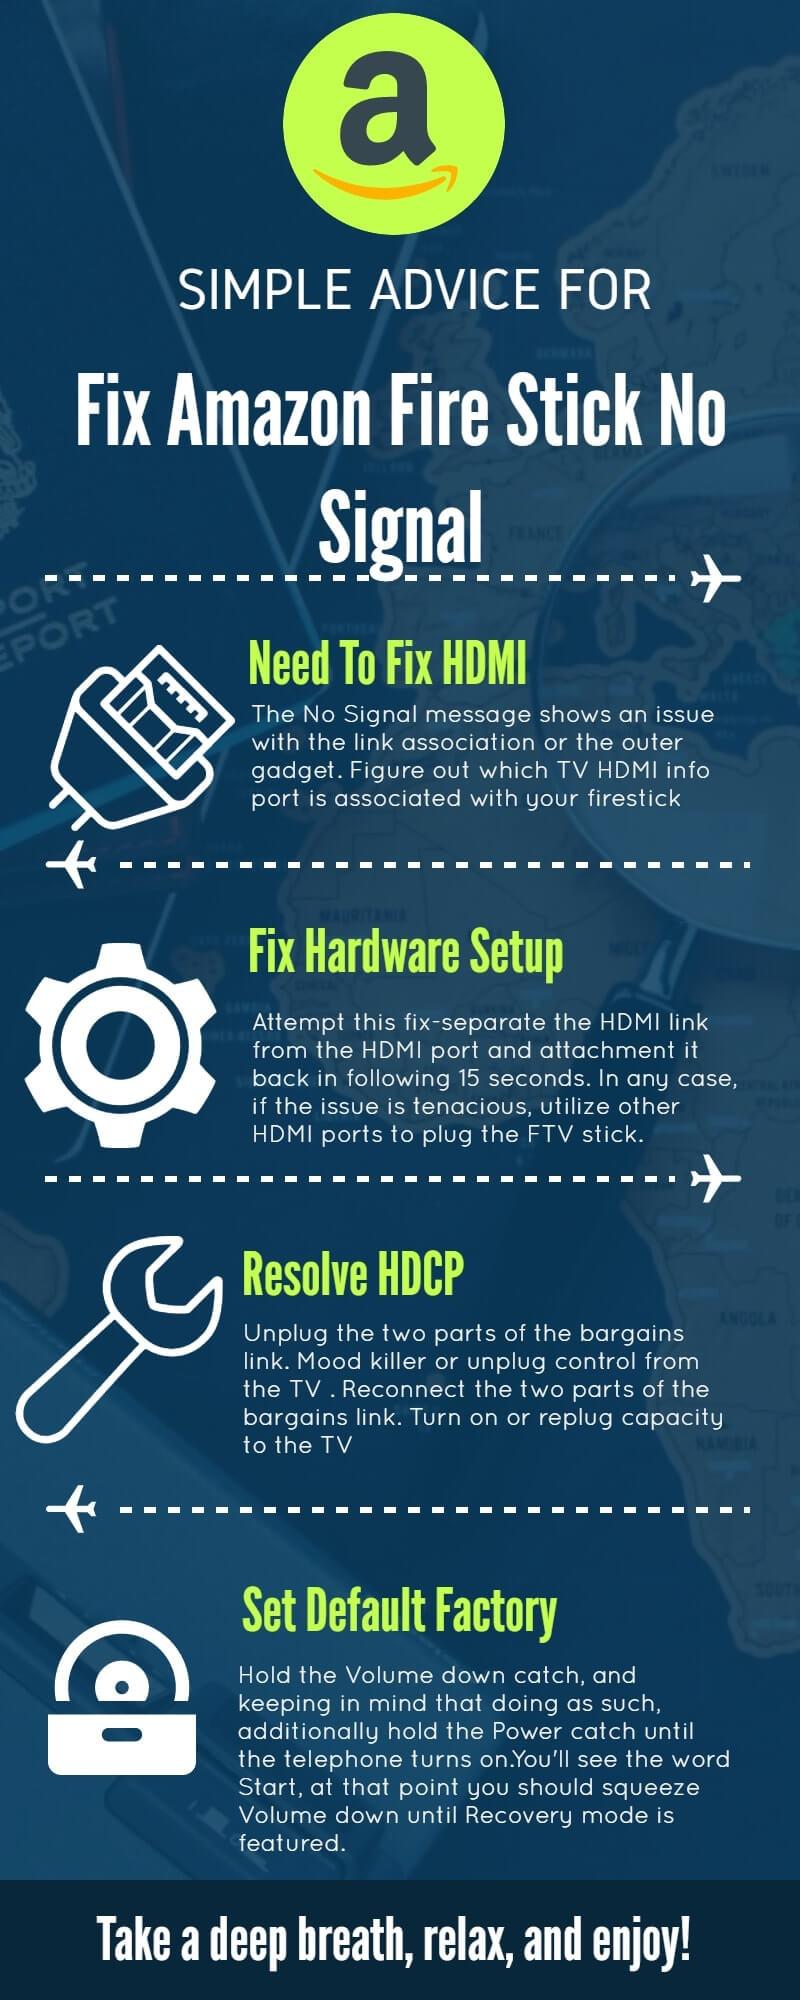 Amazon Firestick No Signal: 2 Min Fix (844-464-3666) - FS Solutions